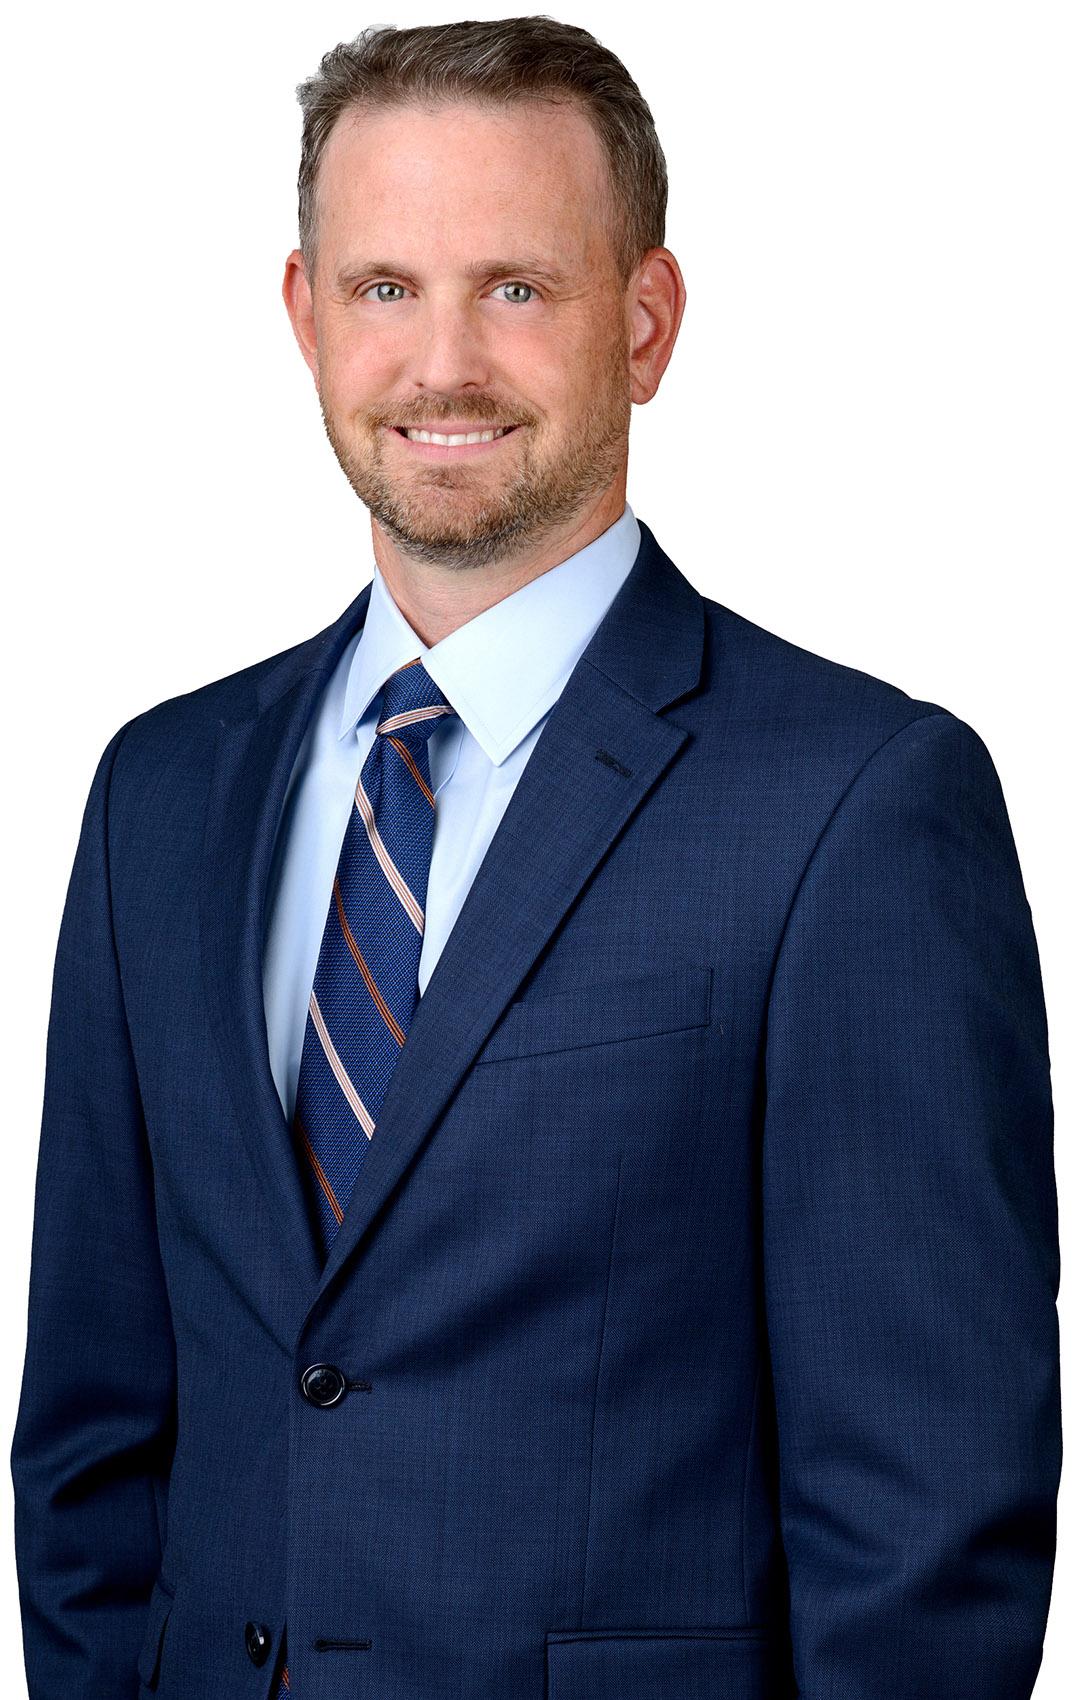 Jeremy Springhart